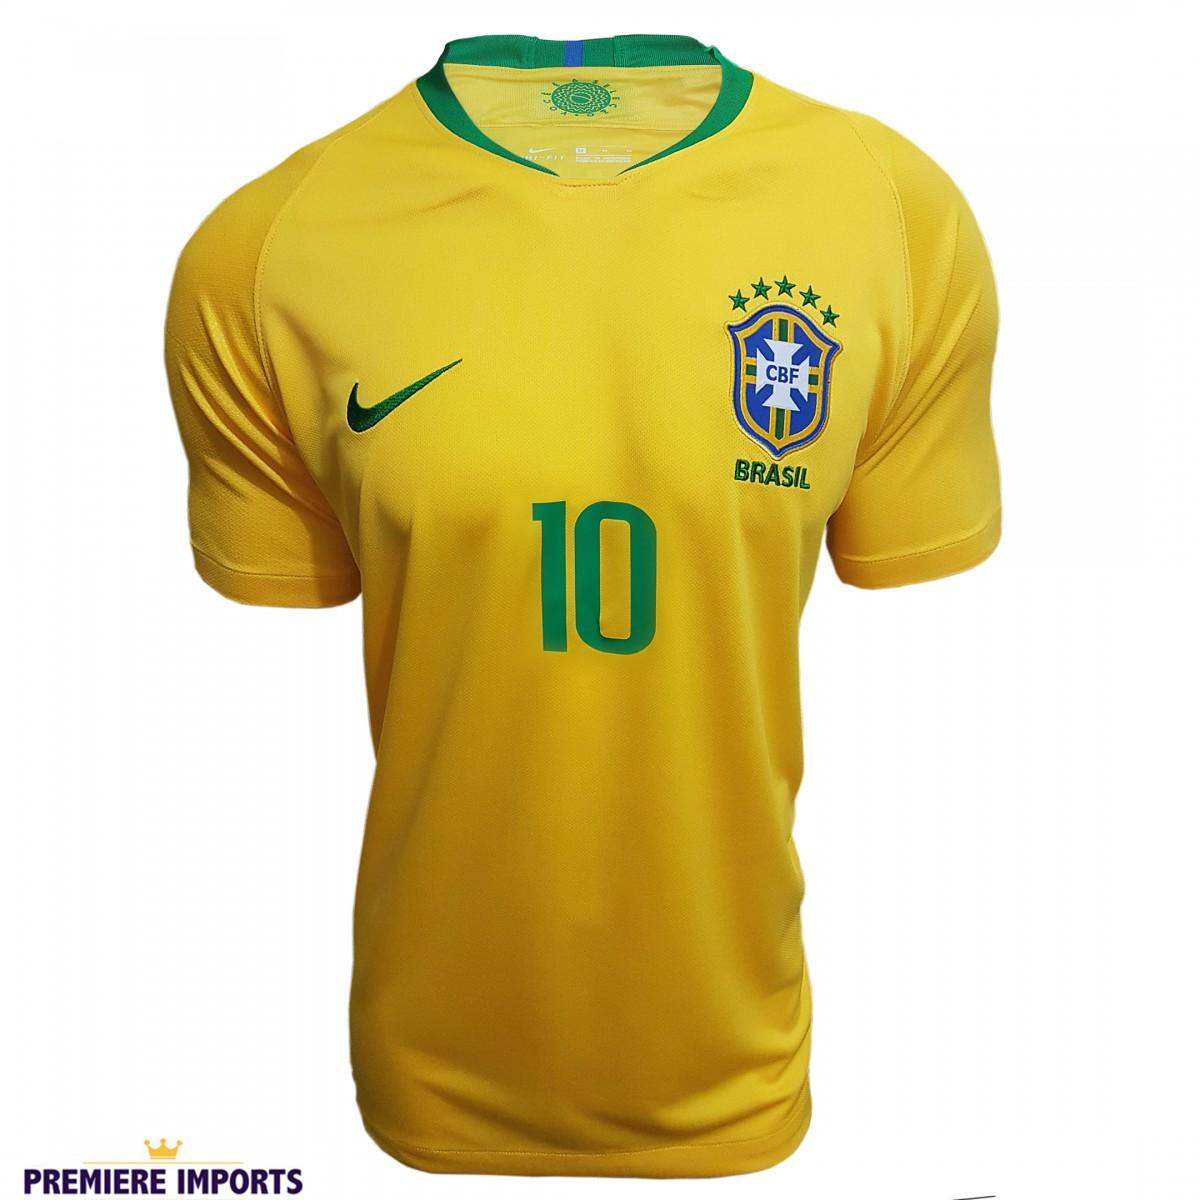 Foto 1 - Camisa Oficial Brasil Home 2018